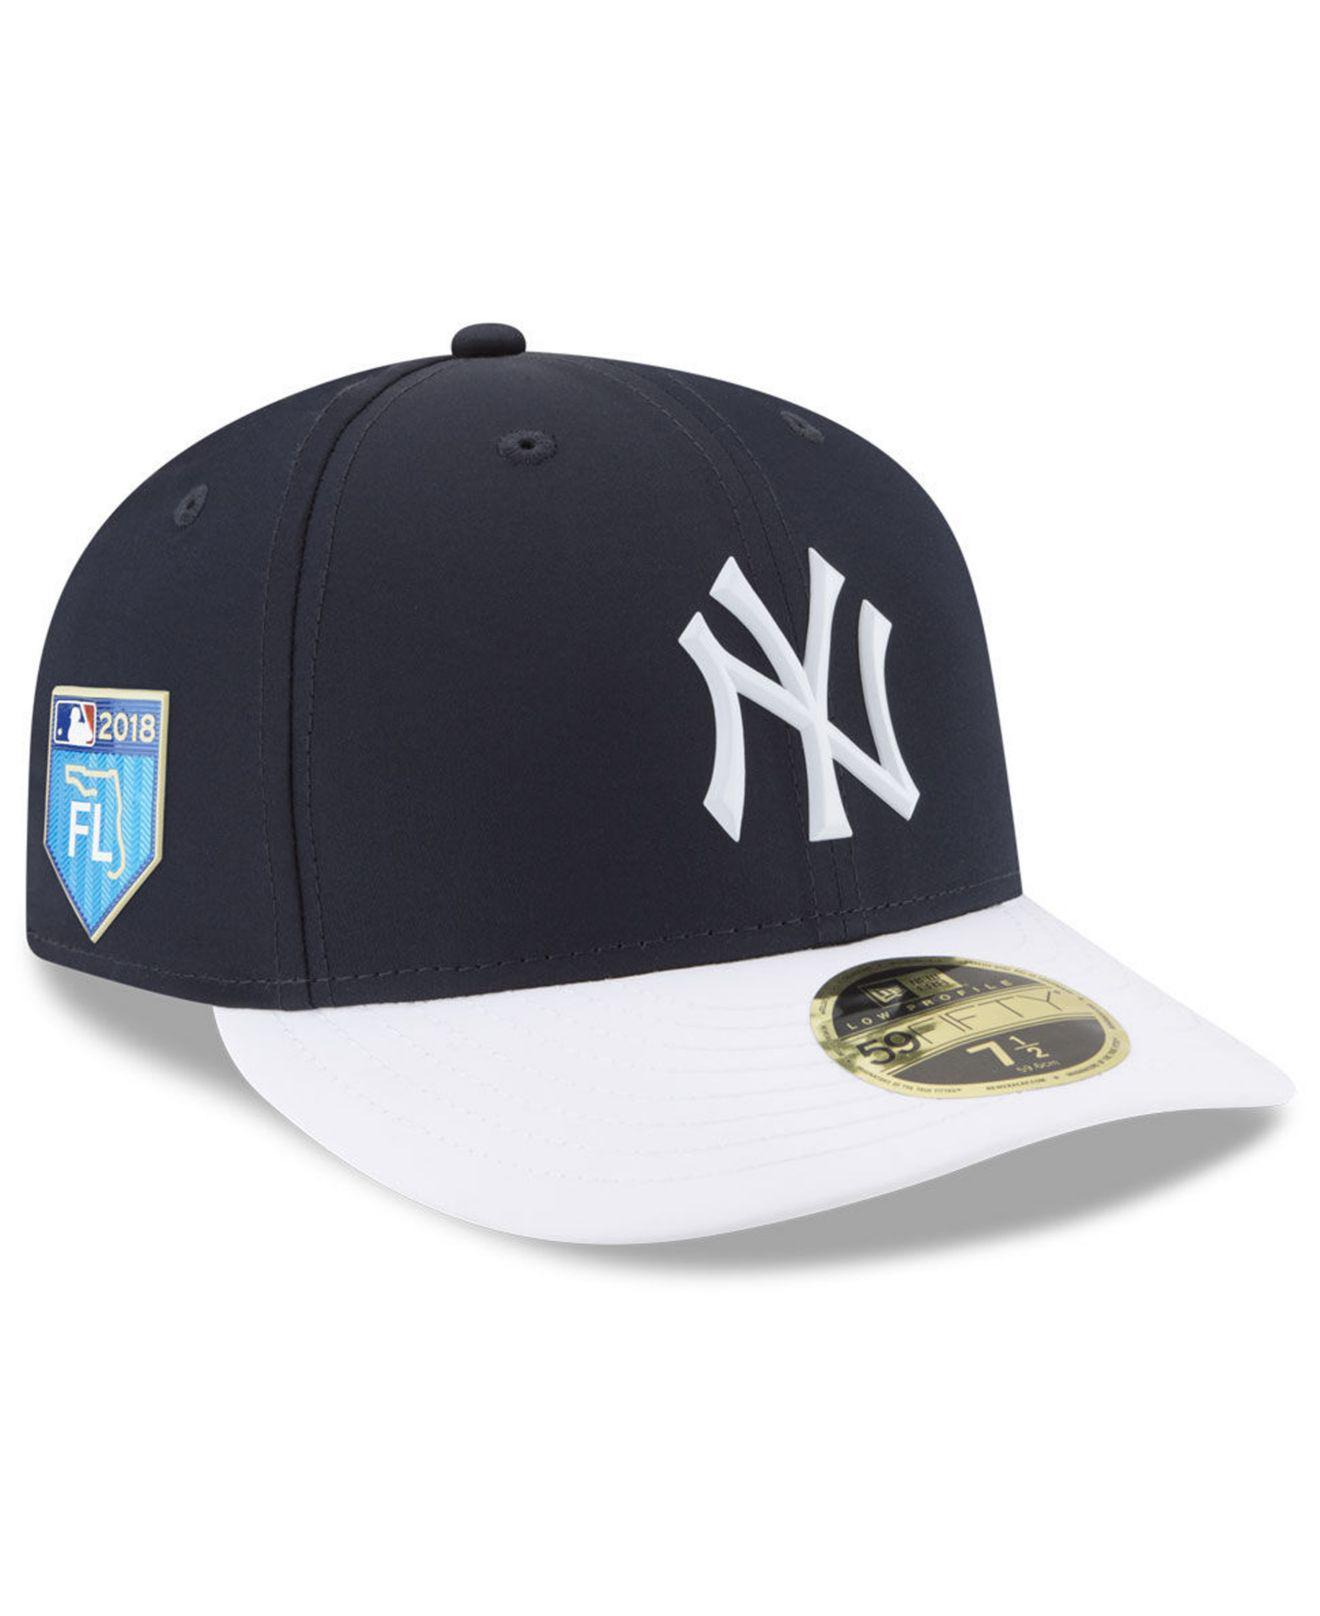 b28f1f7c475444 KTZ. Men's Blue New York Yankees Spring Training Pro Light 59fifty Fitted  Cap